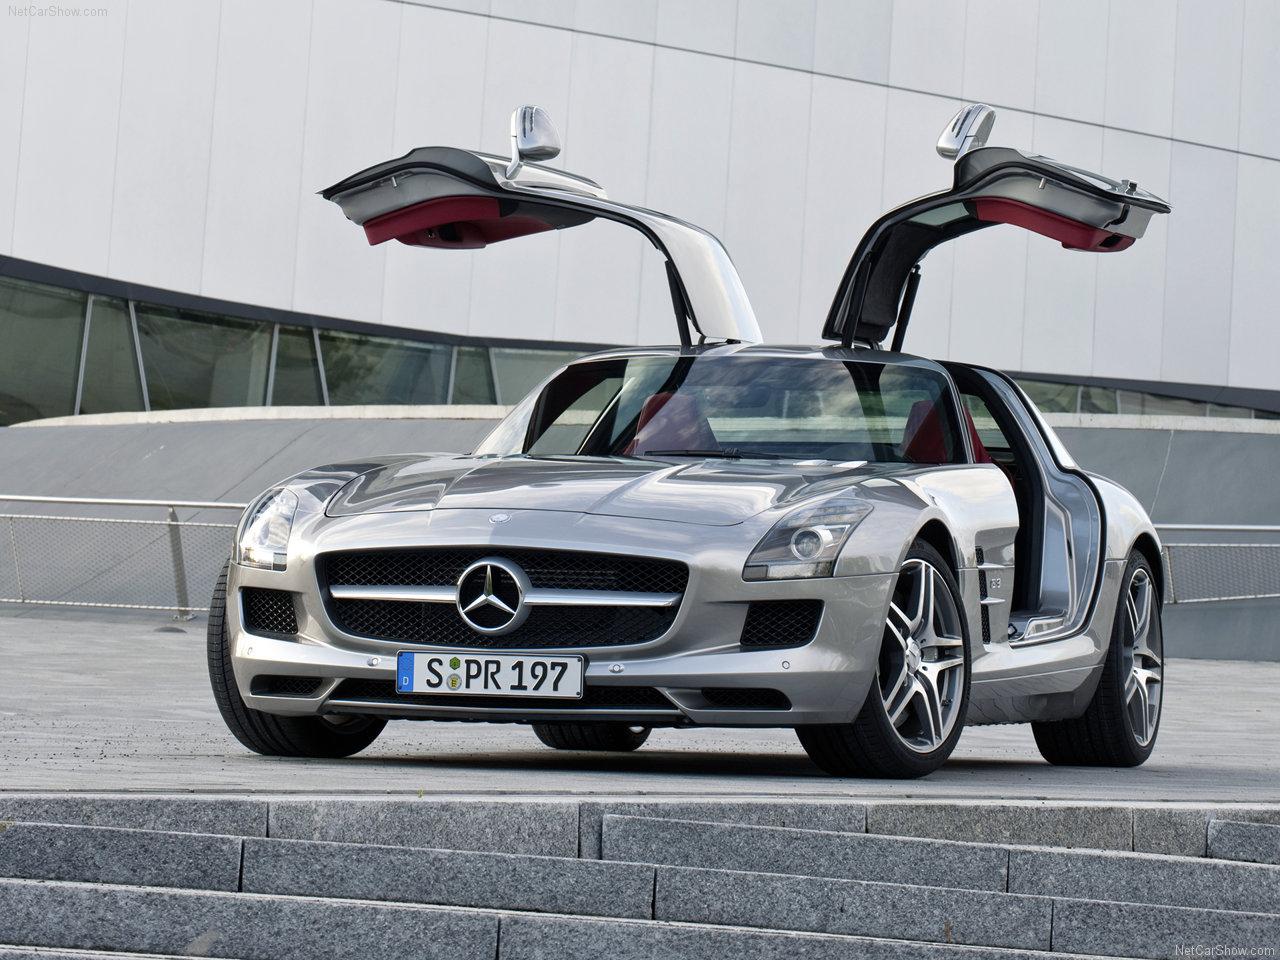 http://1.bp.blogspot.com/_3V1YR3u6VBg/SxBa89WrIVI/AAAAAAAAALE/4n-AzYlO8Rc/s1600/Mercedes-Benz-SLS_AMG_2011_1280x960_wallpaper_05.jpg